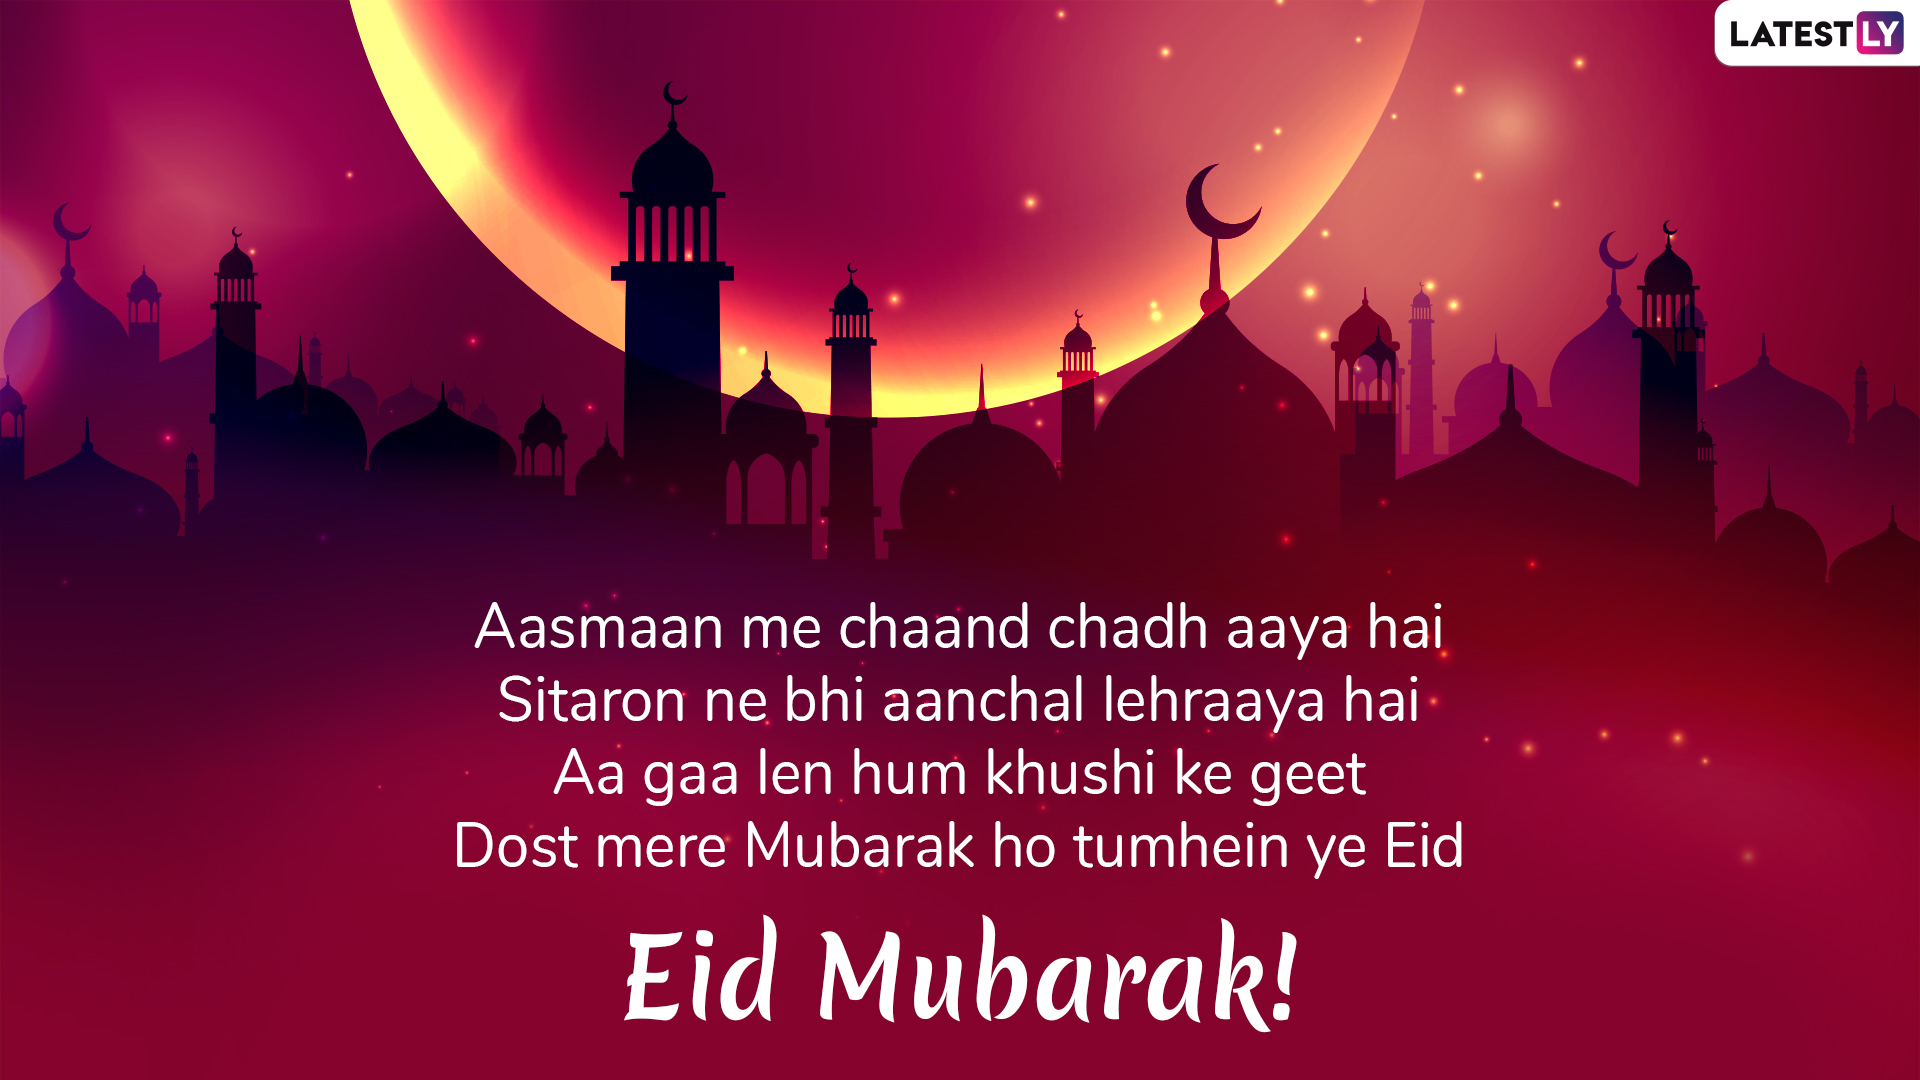 Eid ul-Adha Mubarak 2019 Messages and Images: WhatsApp